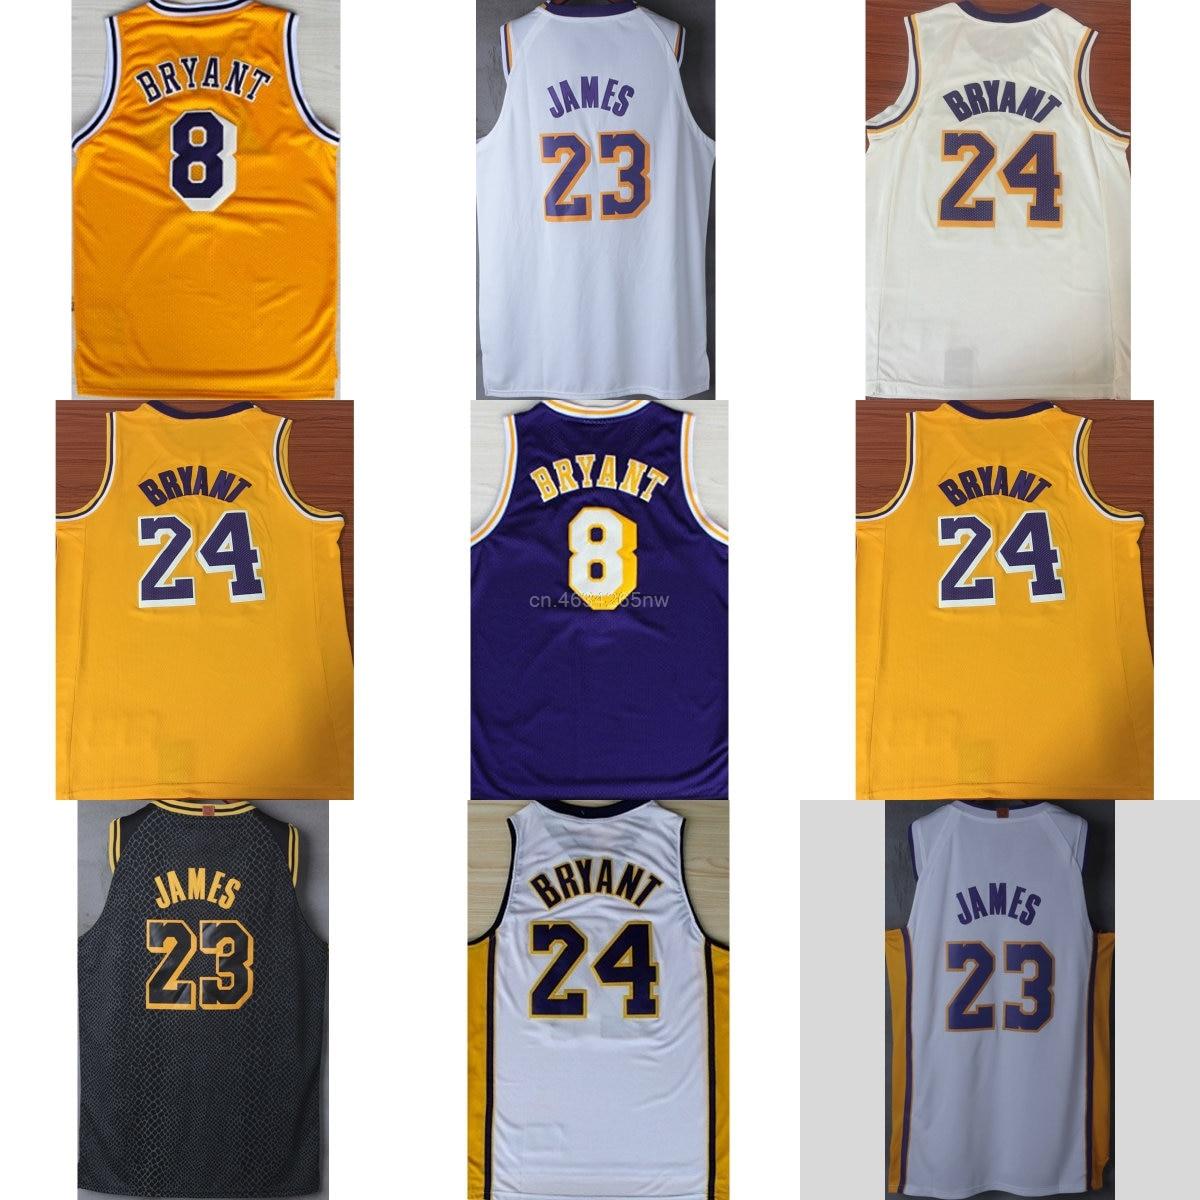 Hot 2018 2019 new Women lebron basketball jerseys james 23 8 24 kobe bryant  jerseys for cheap white yellow black gold purple dfa243350